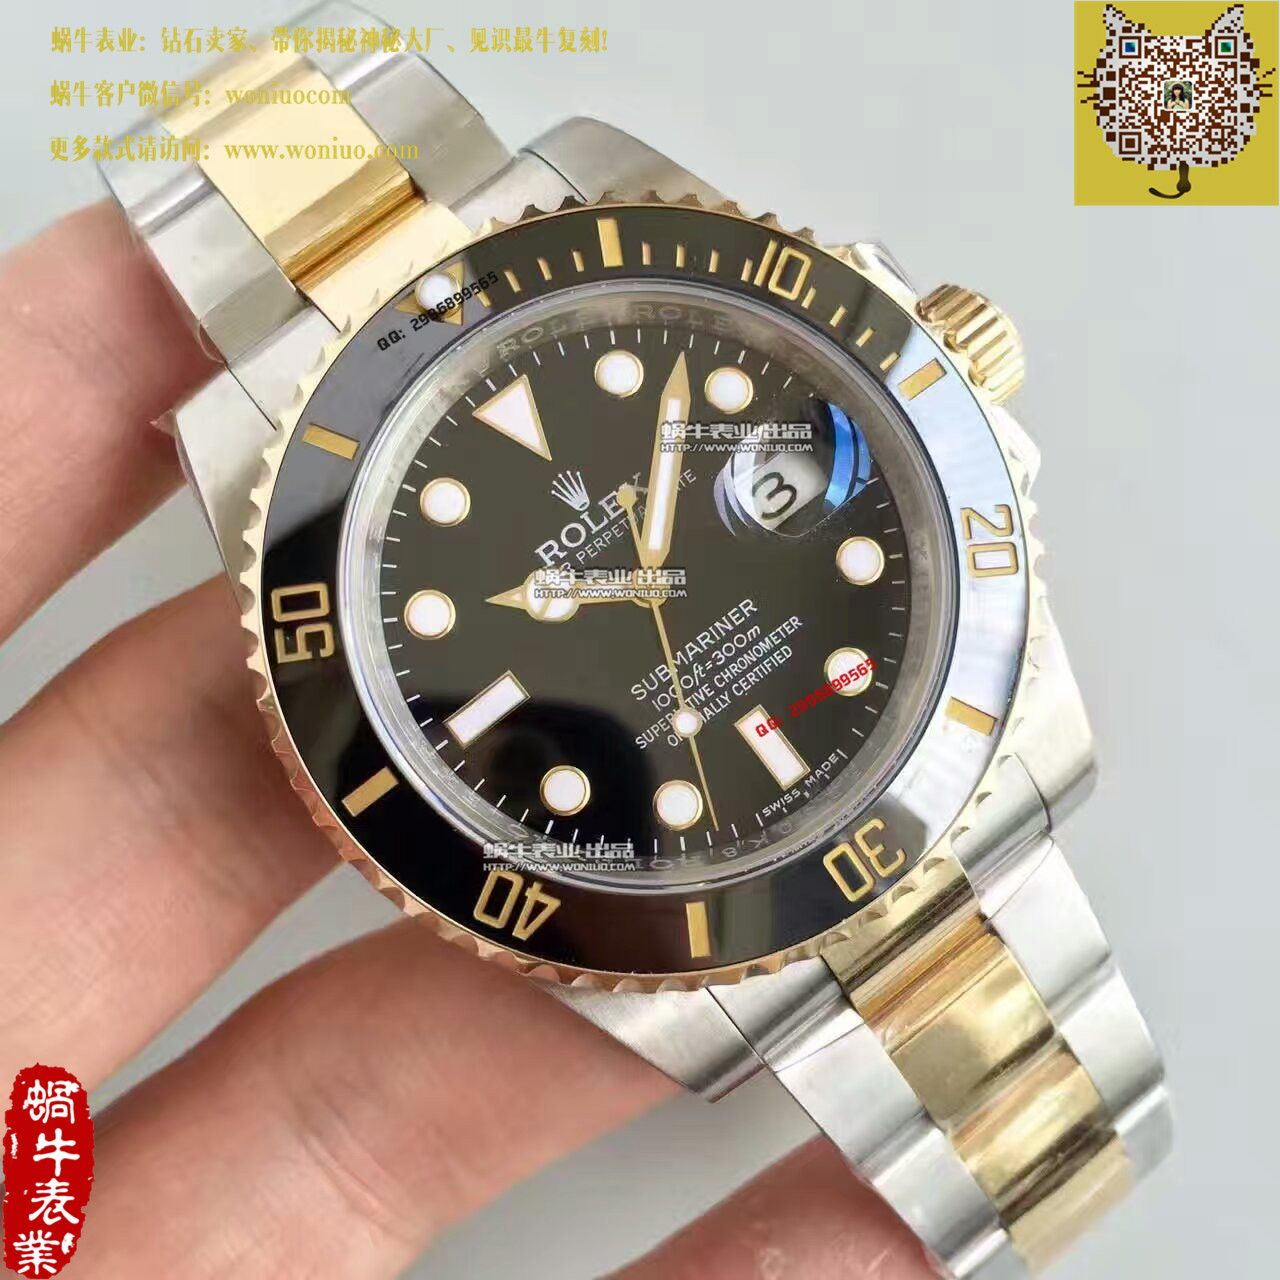 【N厂V7版一比一复刻手表】劳力士潜航者型系列116613-LN-97203《间金黑盘》黑盘机械腕表 / R028